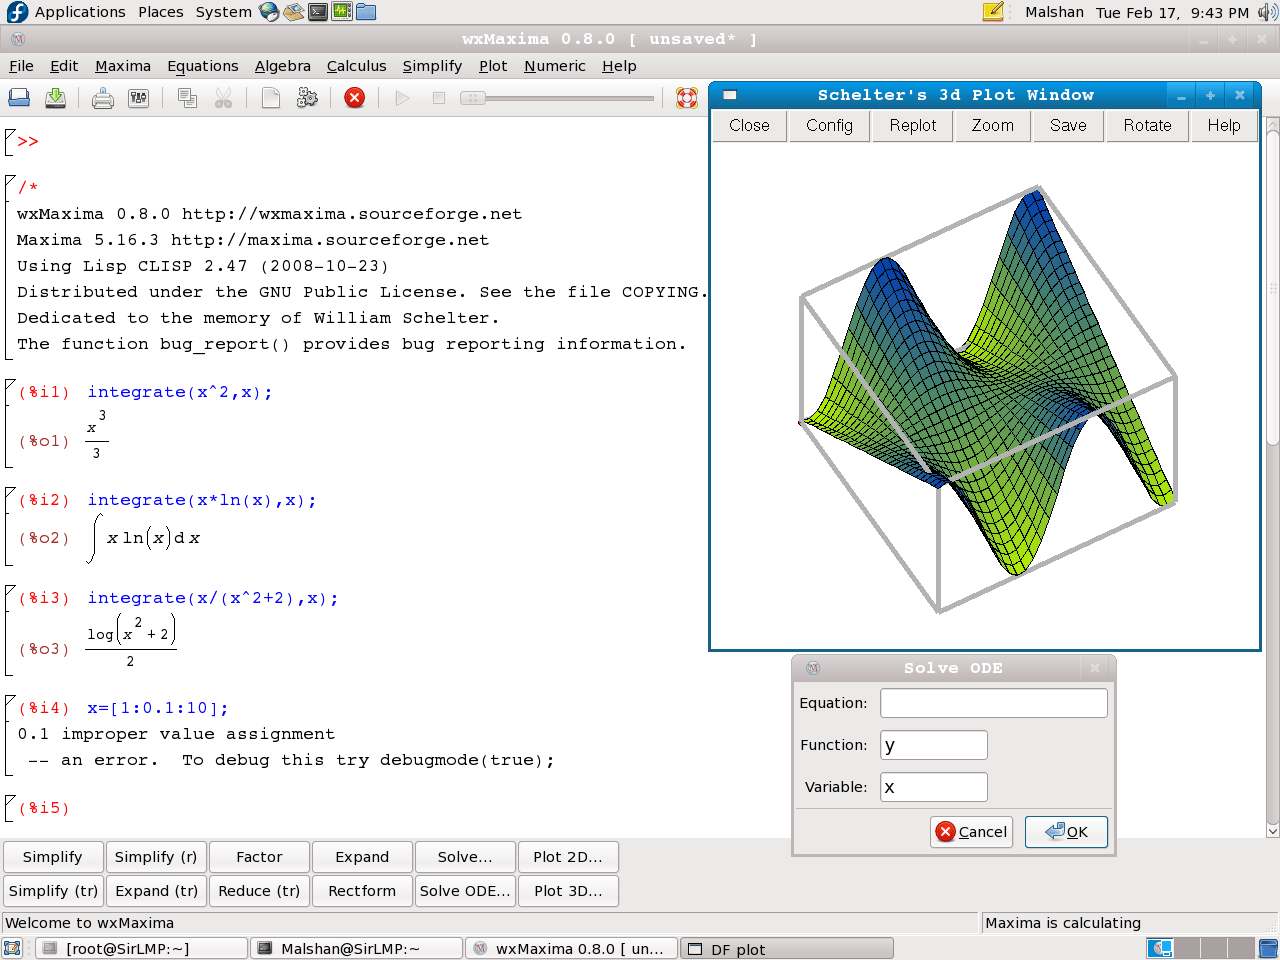 WxMaxima running on FC9, Gnome